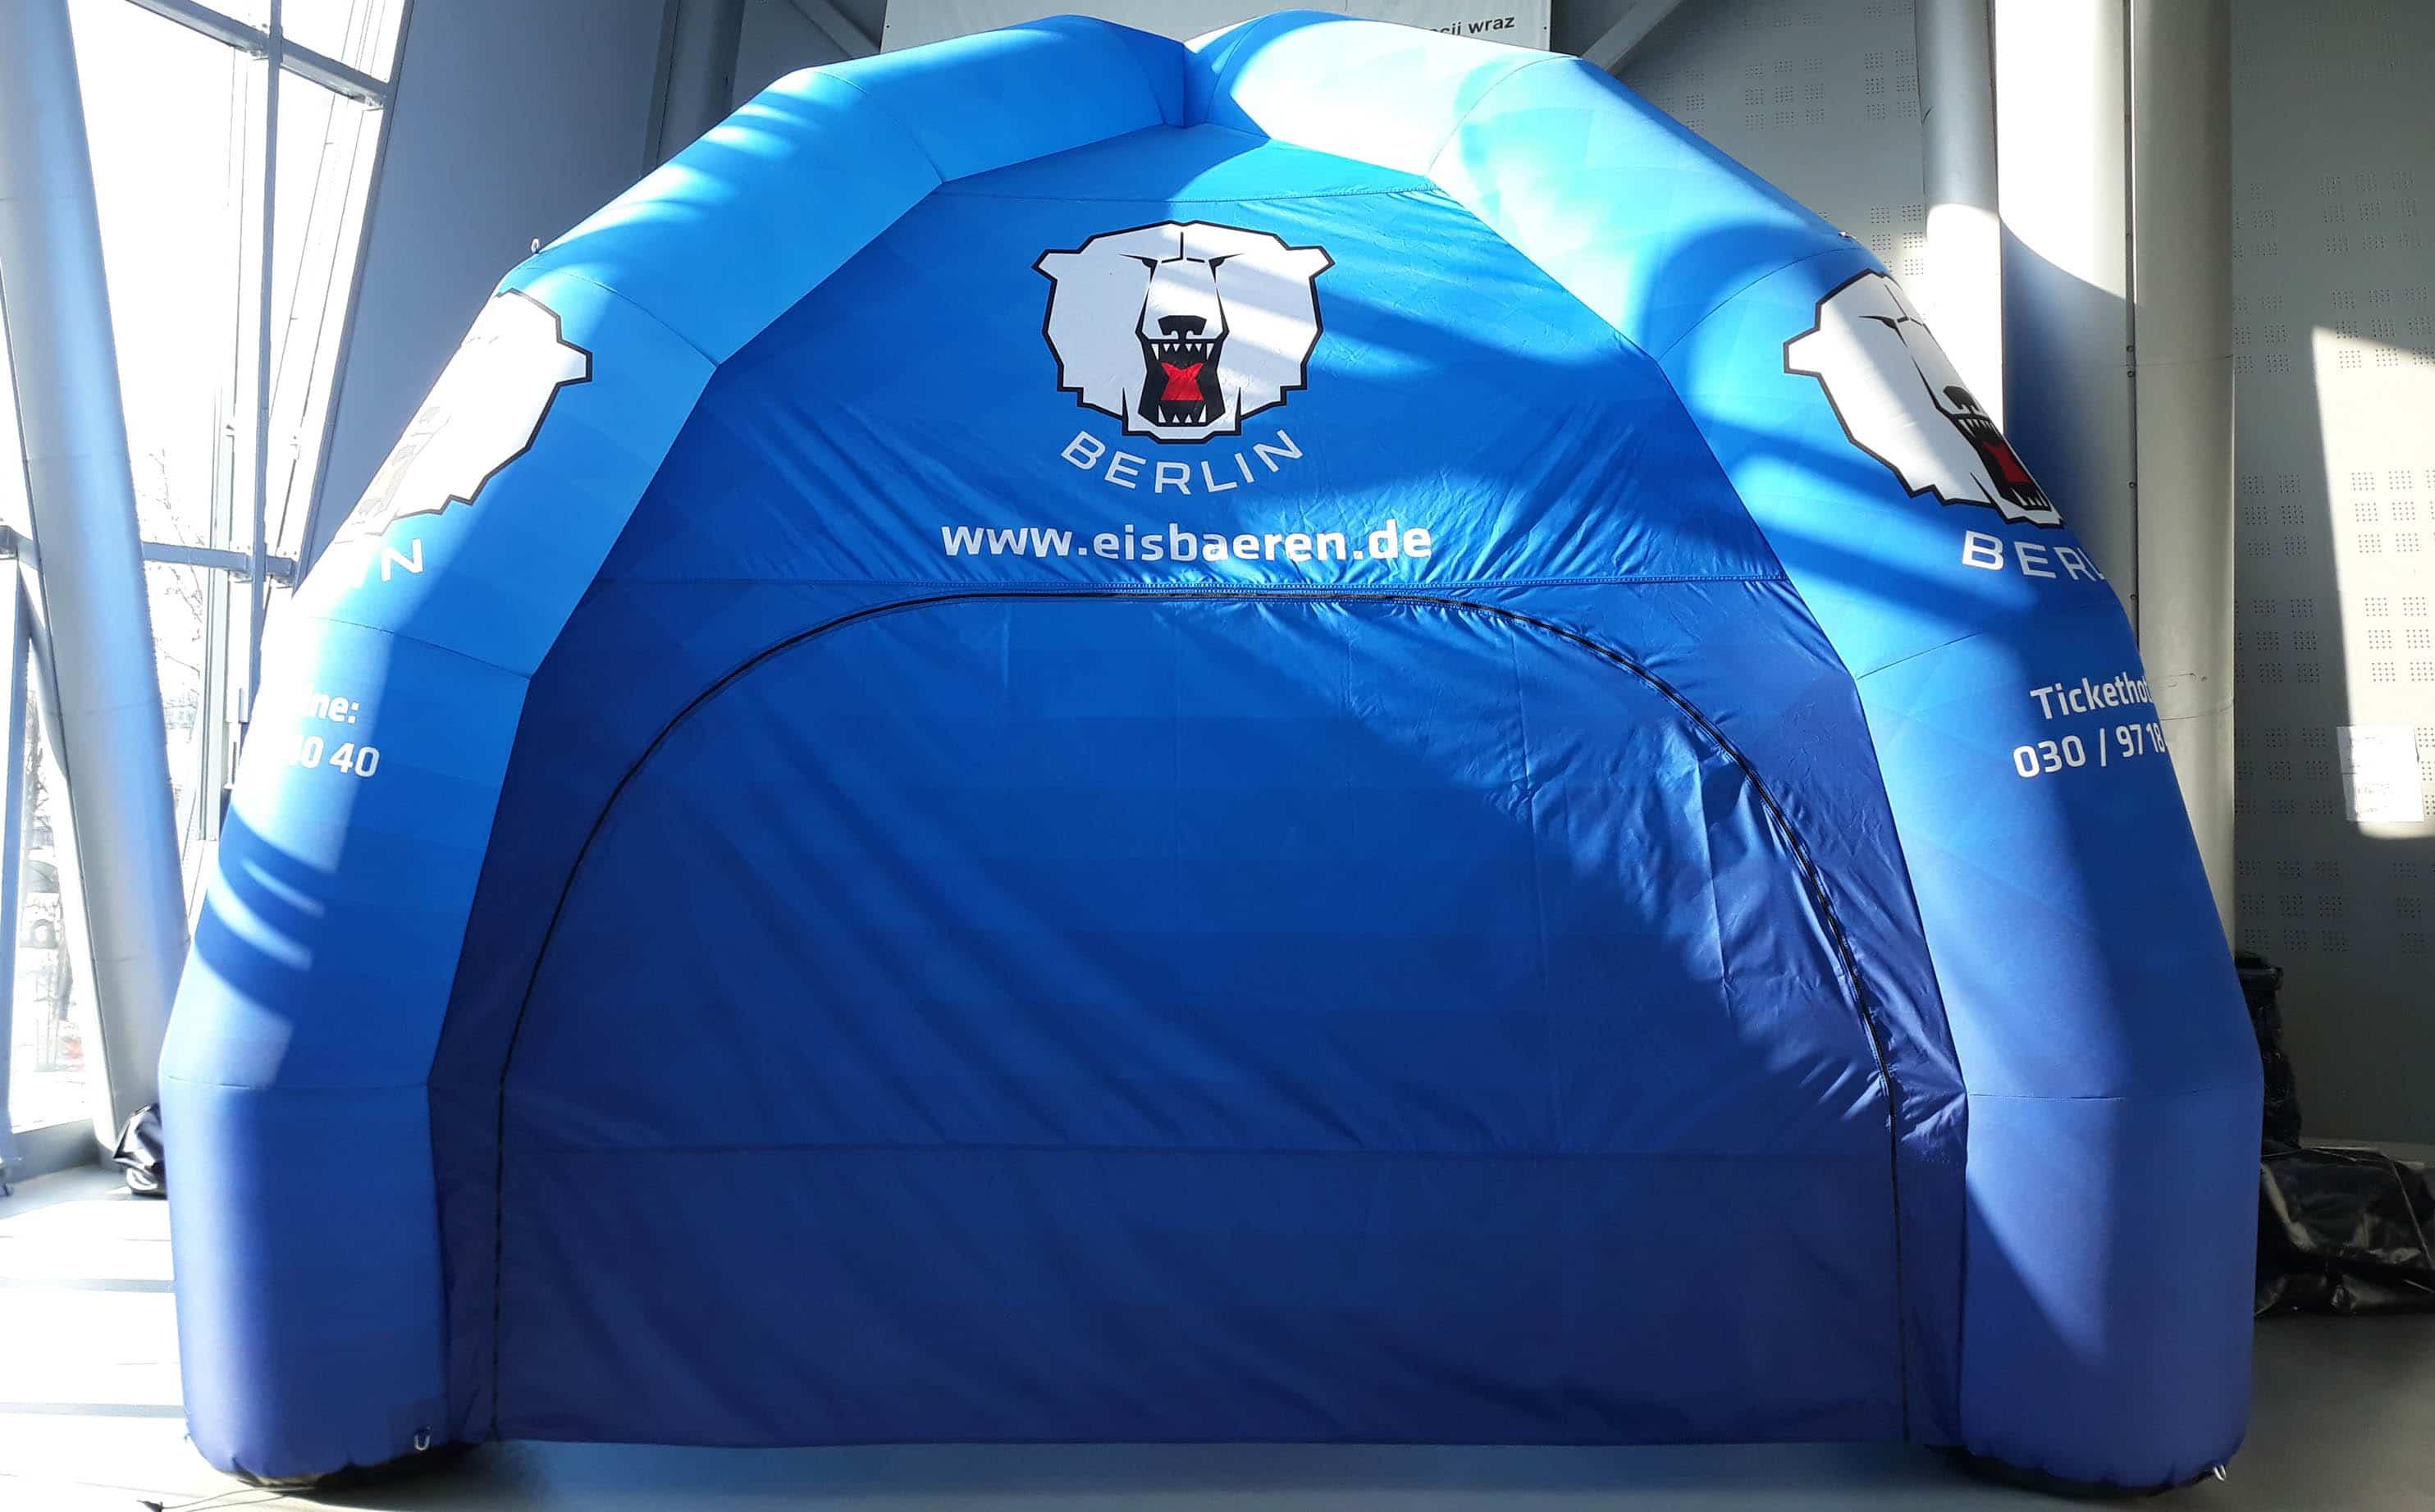 Spider Tent 5x5m